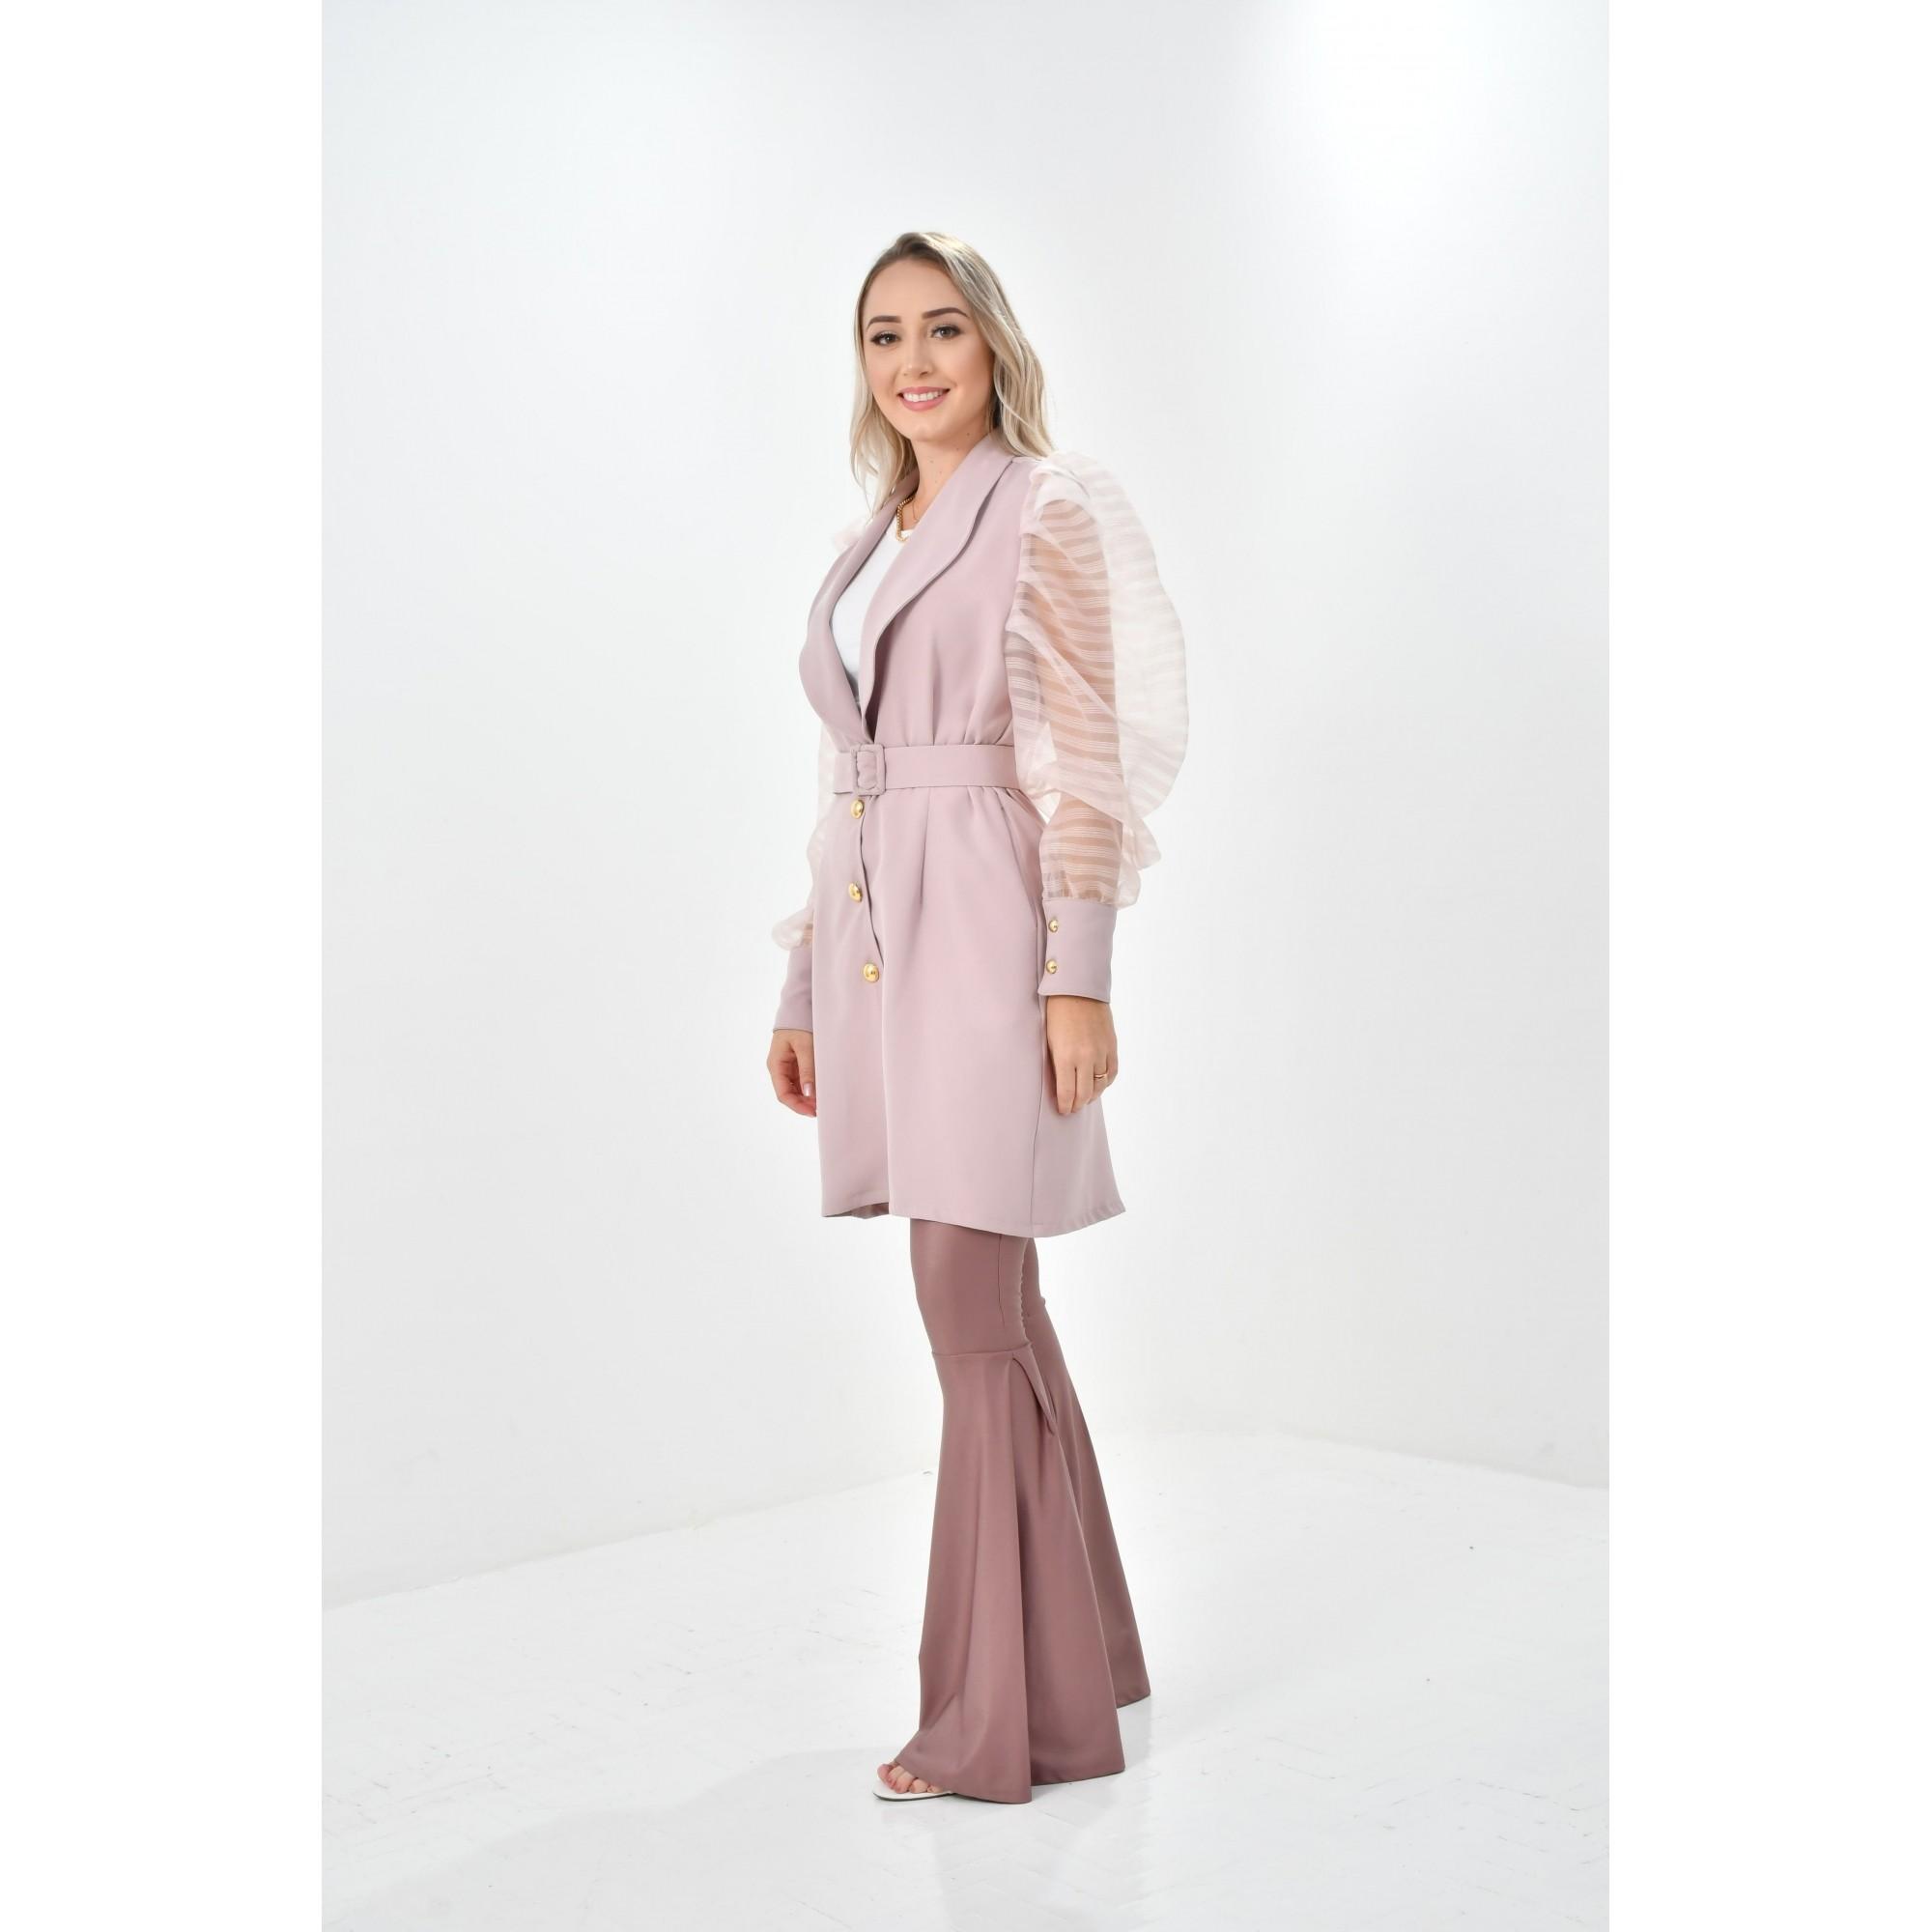 Jaleco Vitória  - Luxo Branco - Jalecos Personalizado Feminino